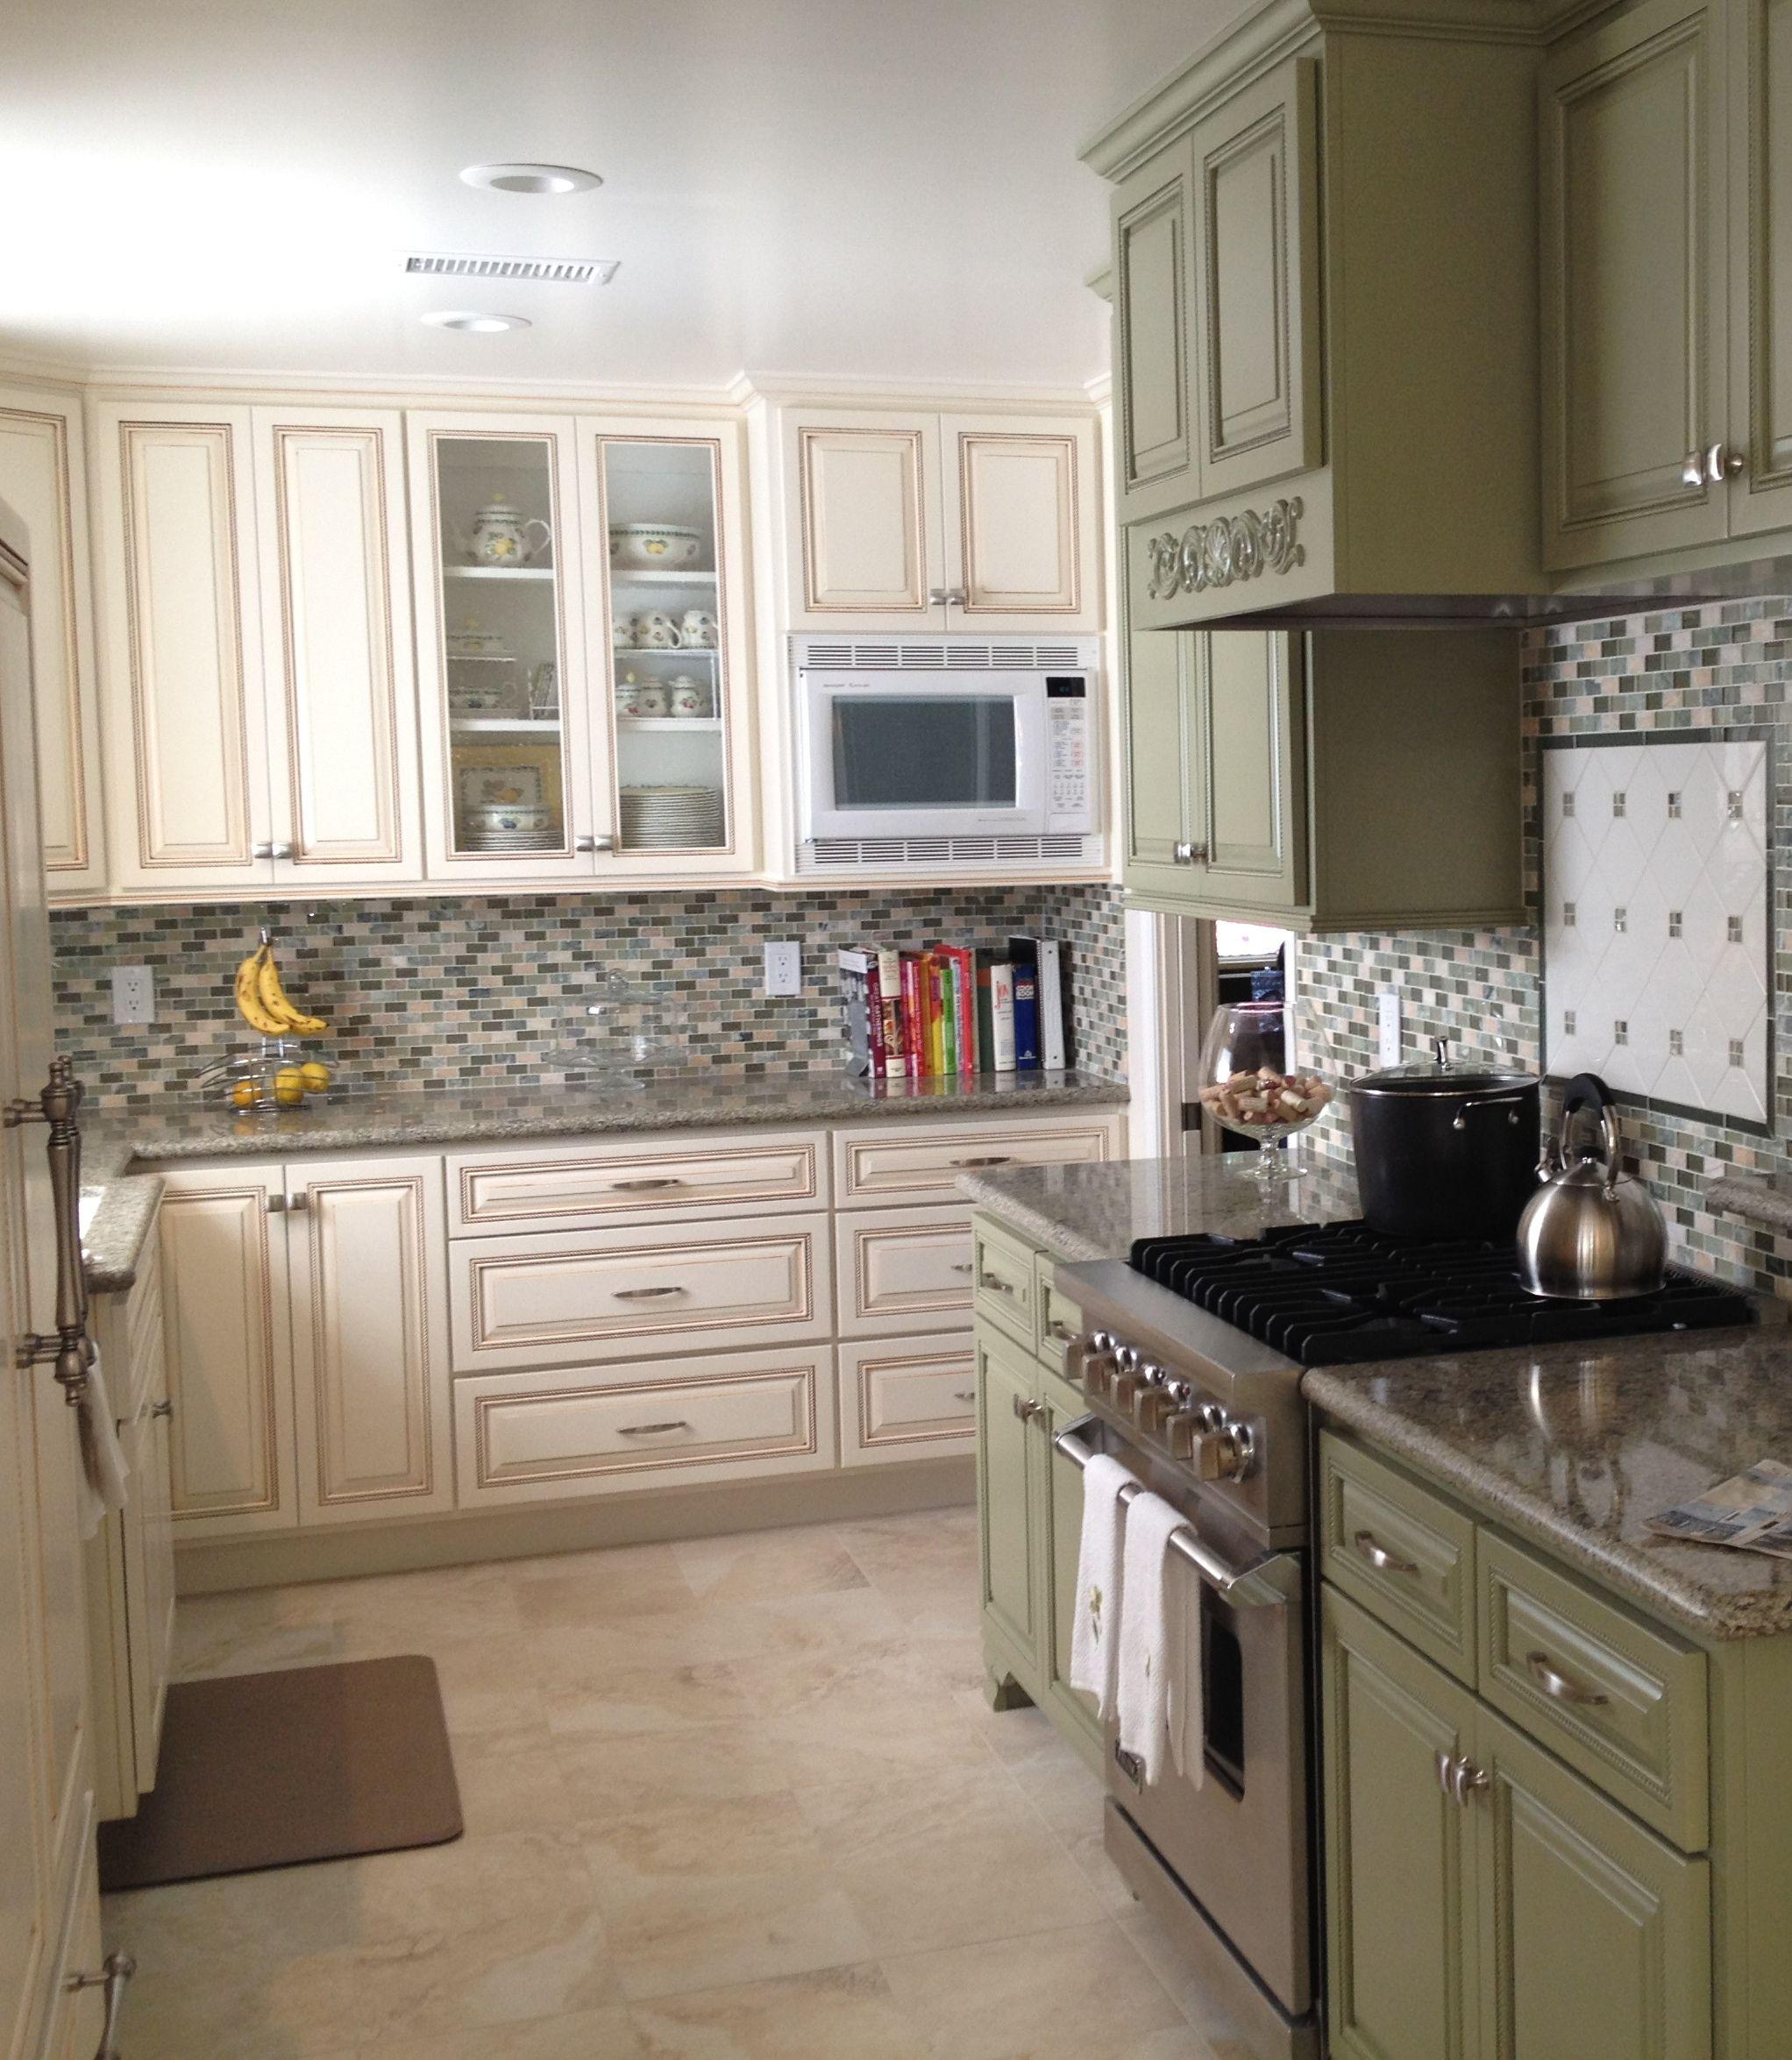 Pearl White Cabinets With Carmel Glaze Seafoam Green On Range